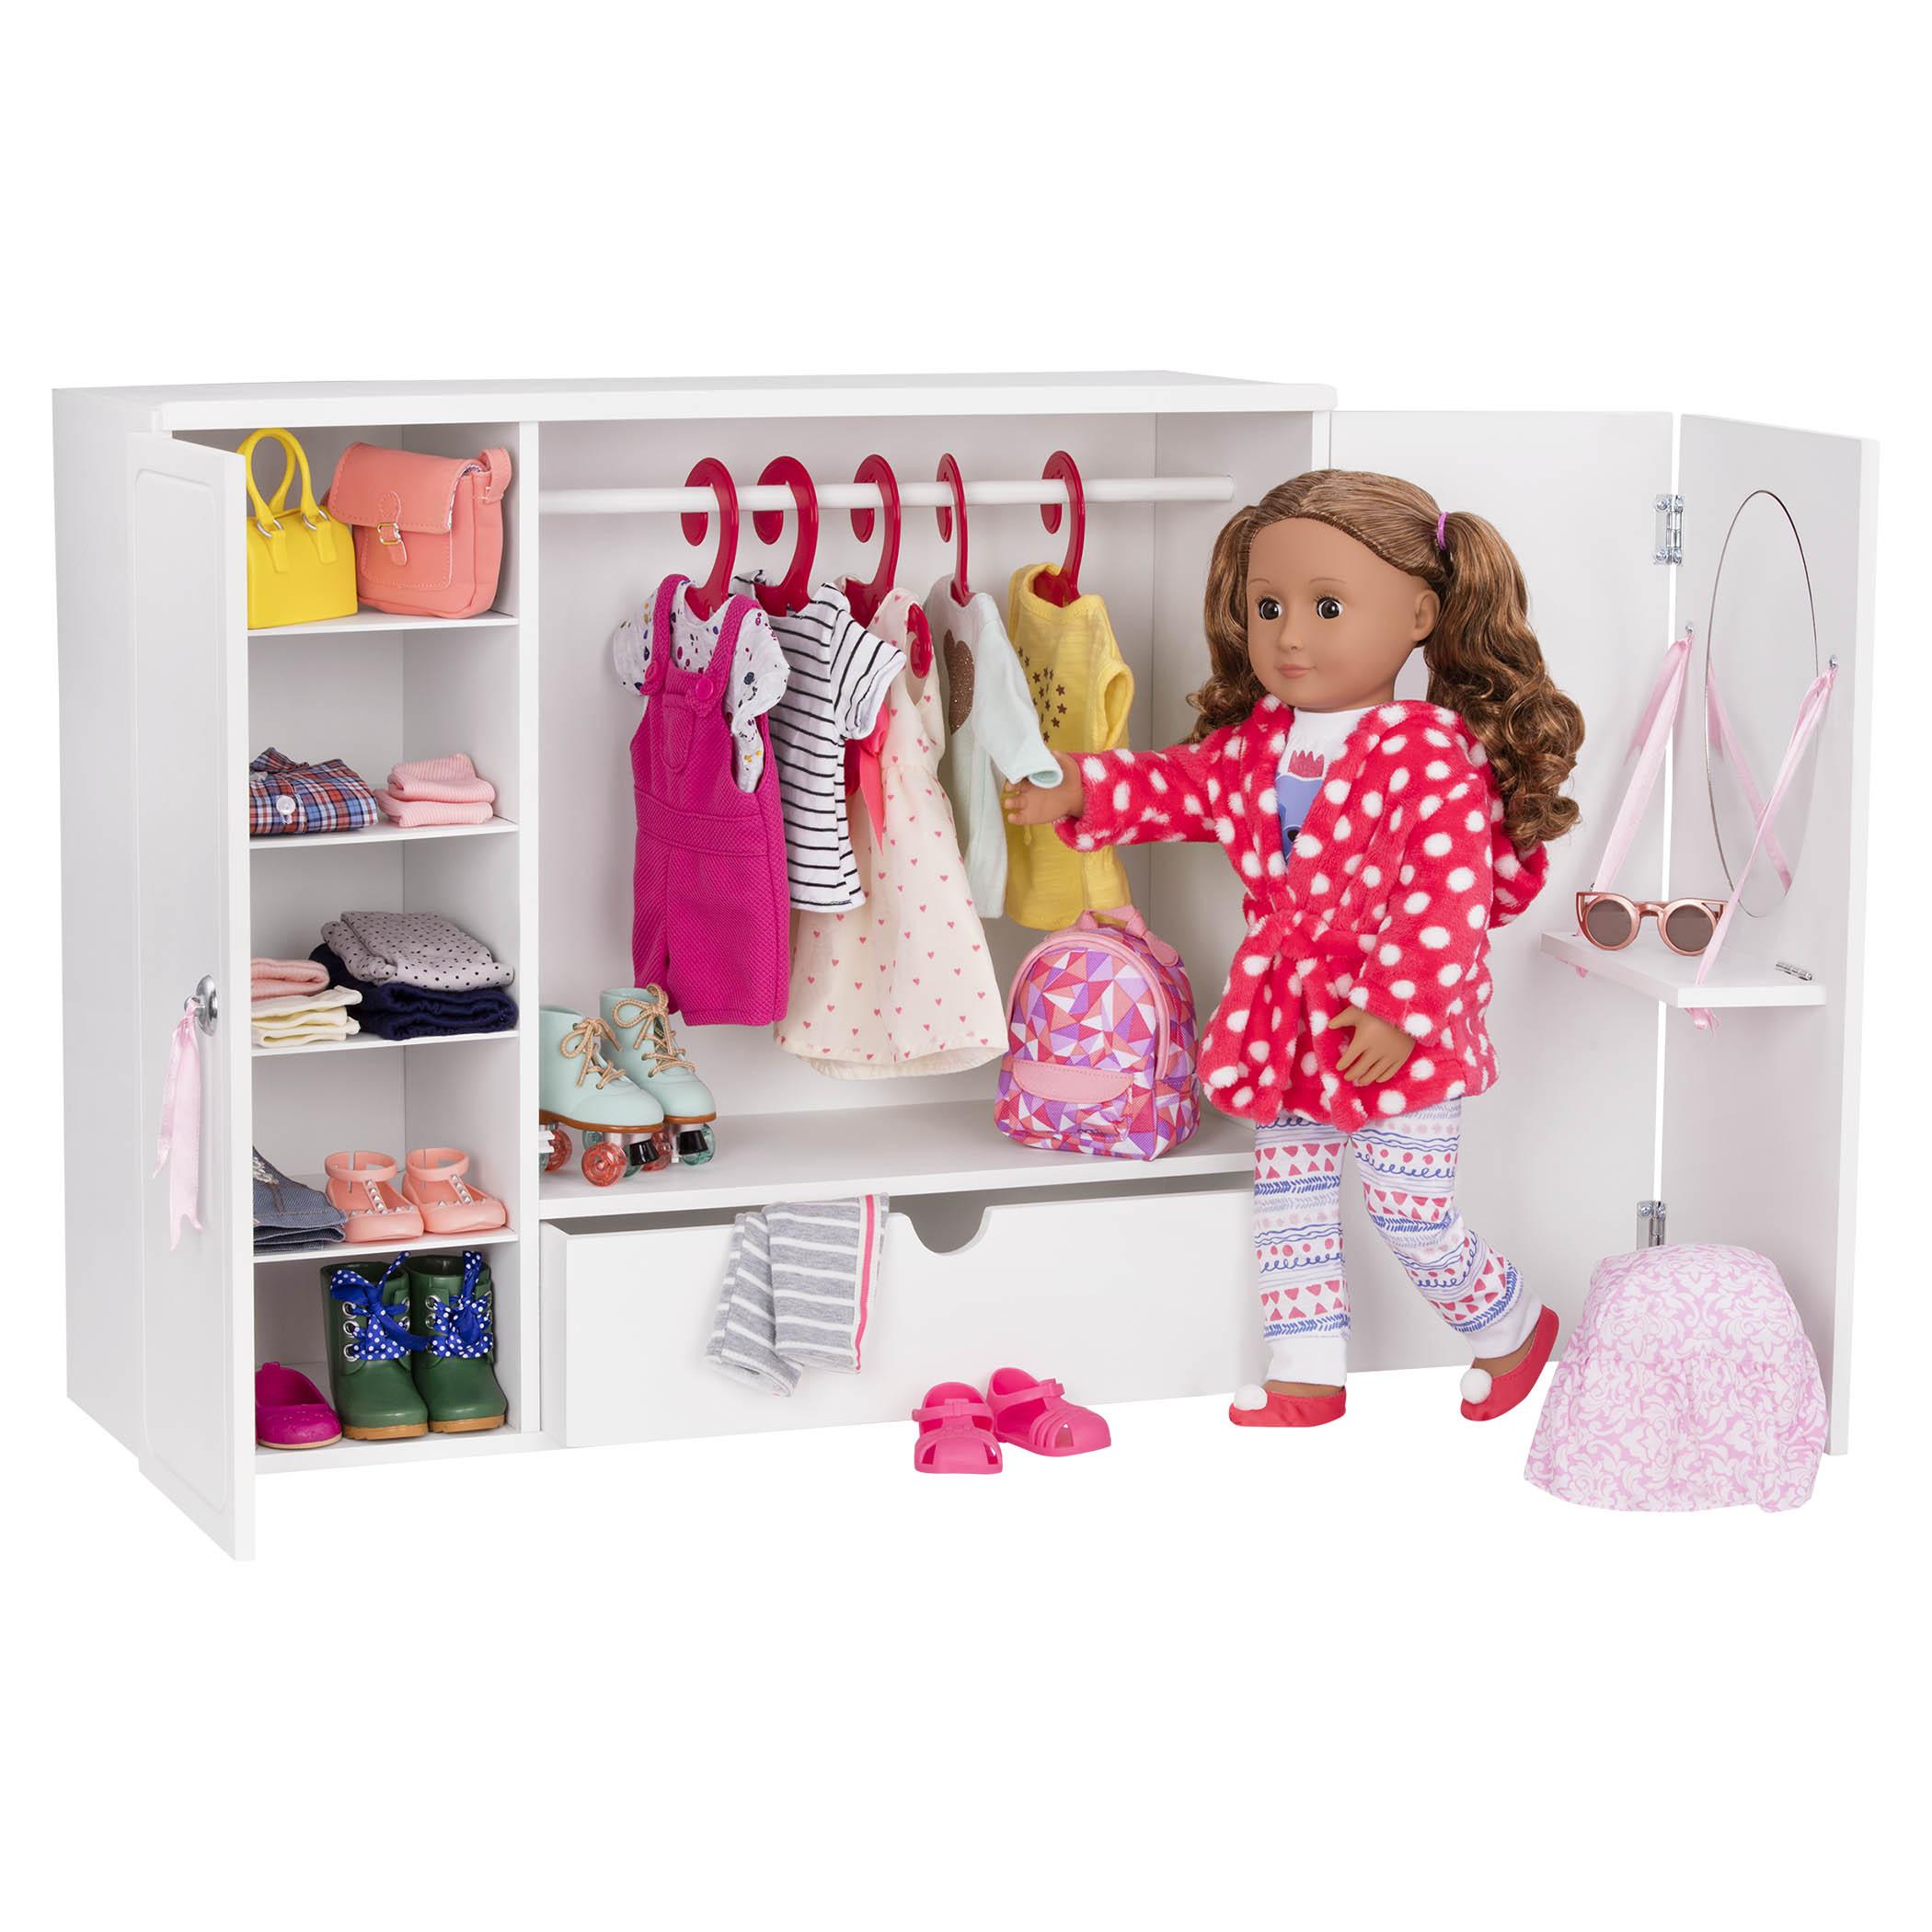 Pick a Theme for your sleepover, like a pajama party fashion show!